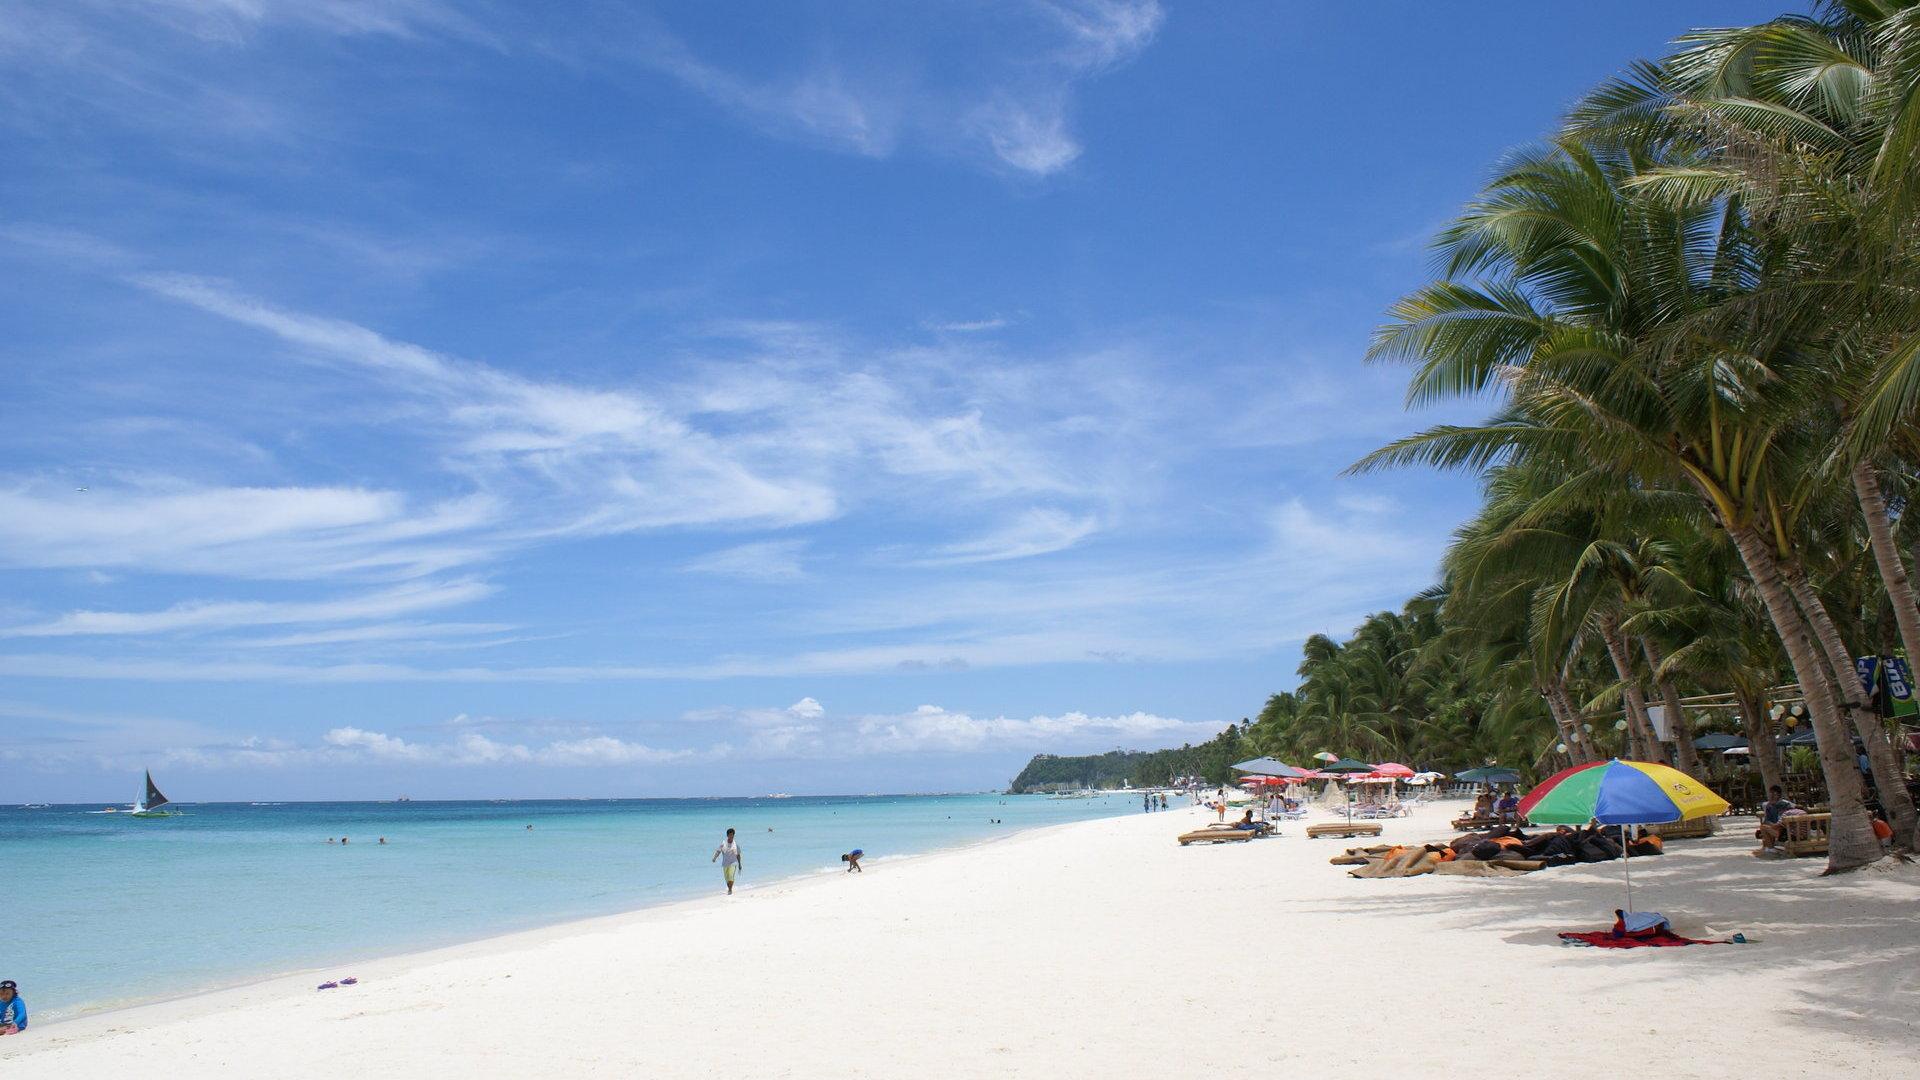 wallpaper download beautiful island beaches 1920x1080px HDTV 1080p 1920x1080